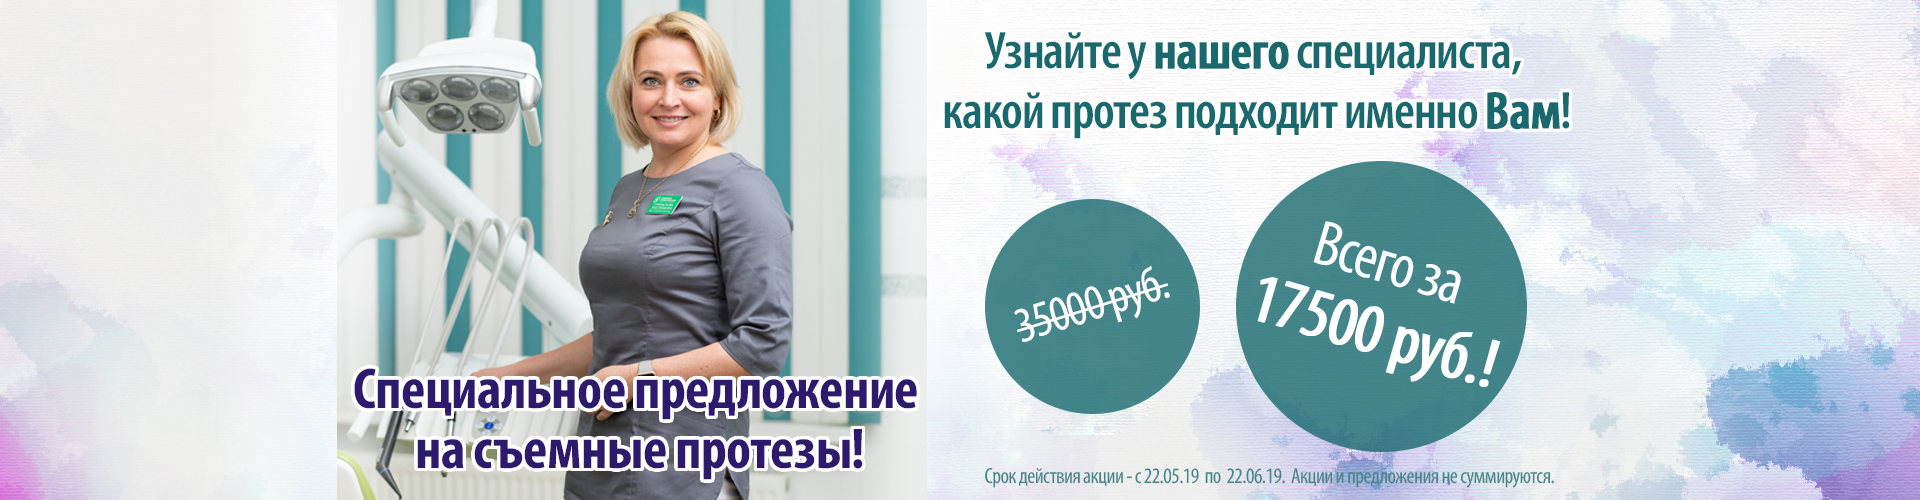 SS_banner_29.10.18_bel_1.jpg